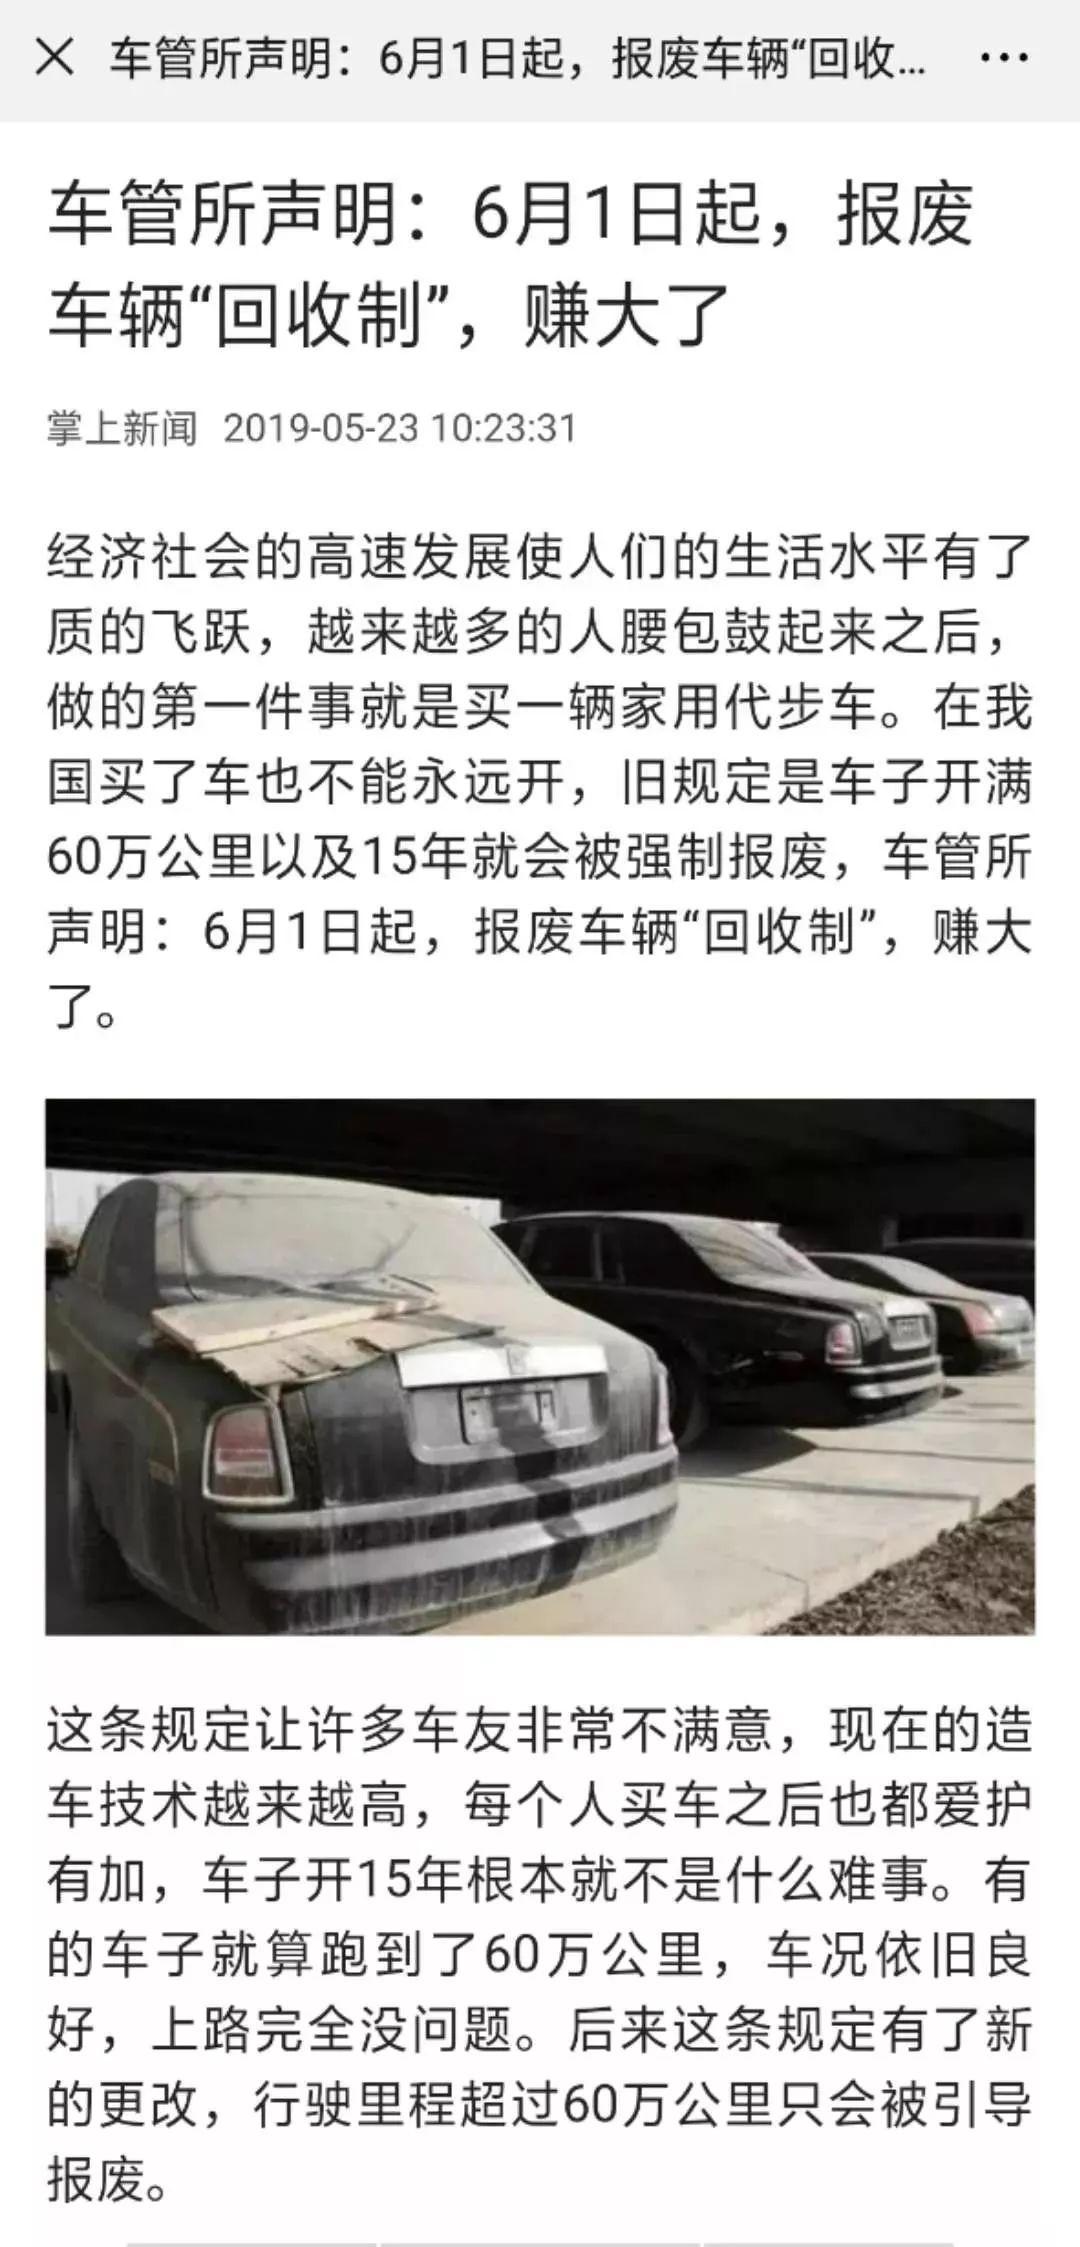 yzca88亚洲城网页版